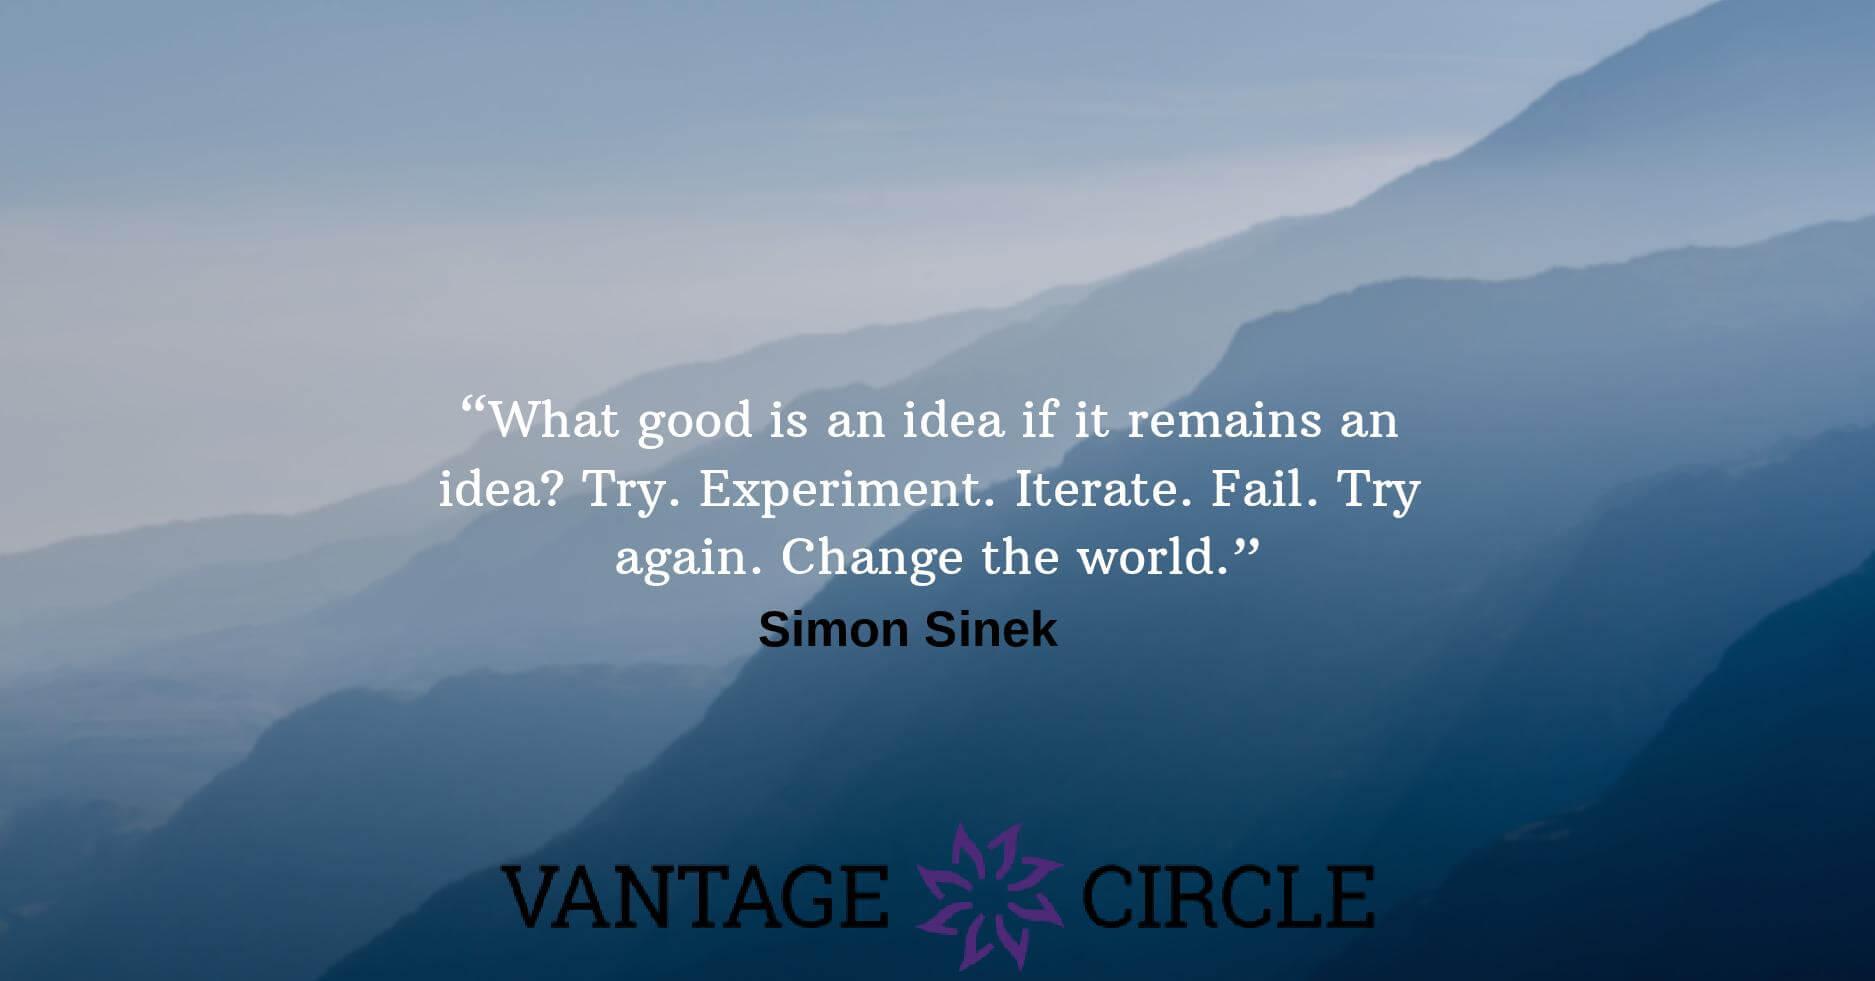 Employee-motivational-quotes-Simon-Sinek